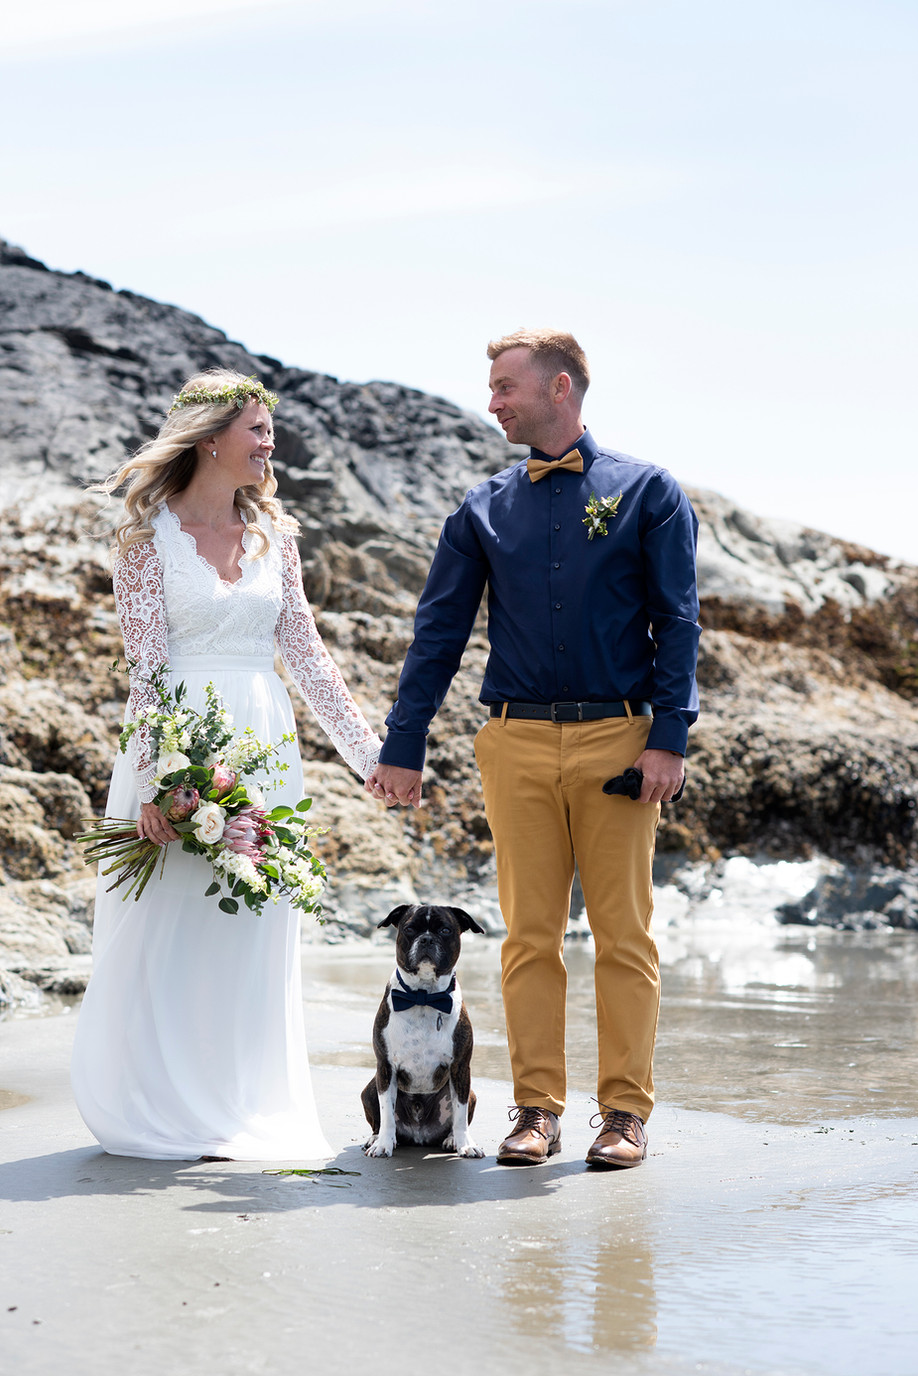 Beach Wedding in Tofino || Mo & Ryan || Tofino Wedding Photography